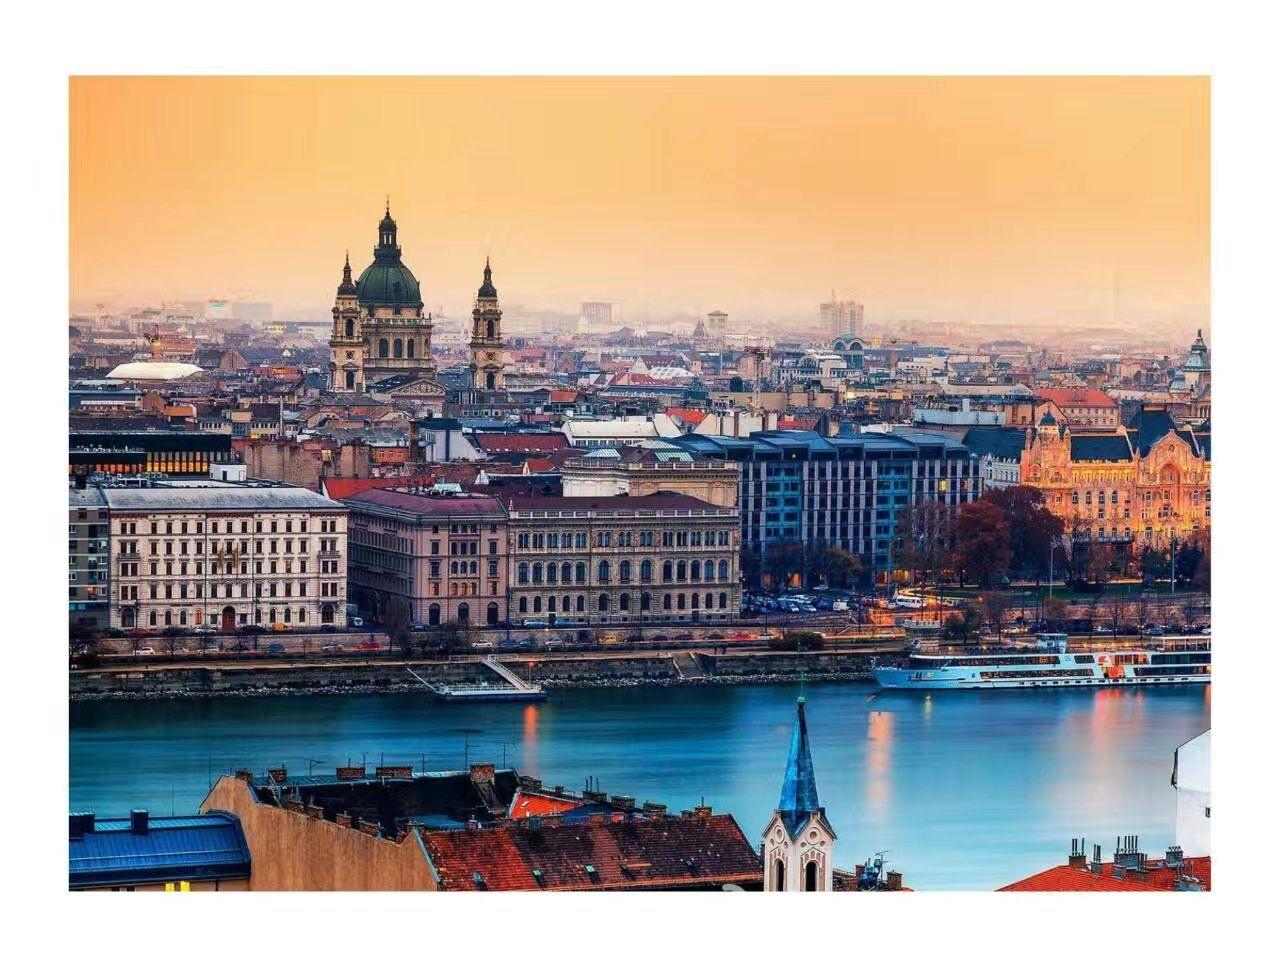 布达佩斯喜剧剧院  Comedy Theatre of Budapest   -1